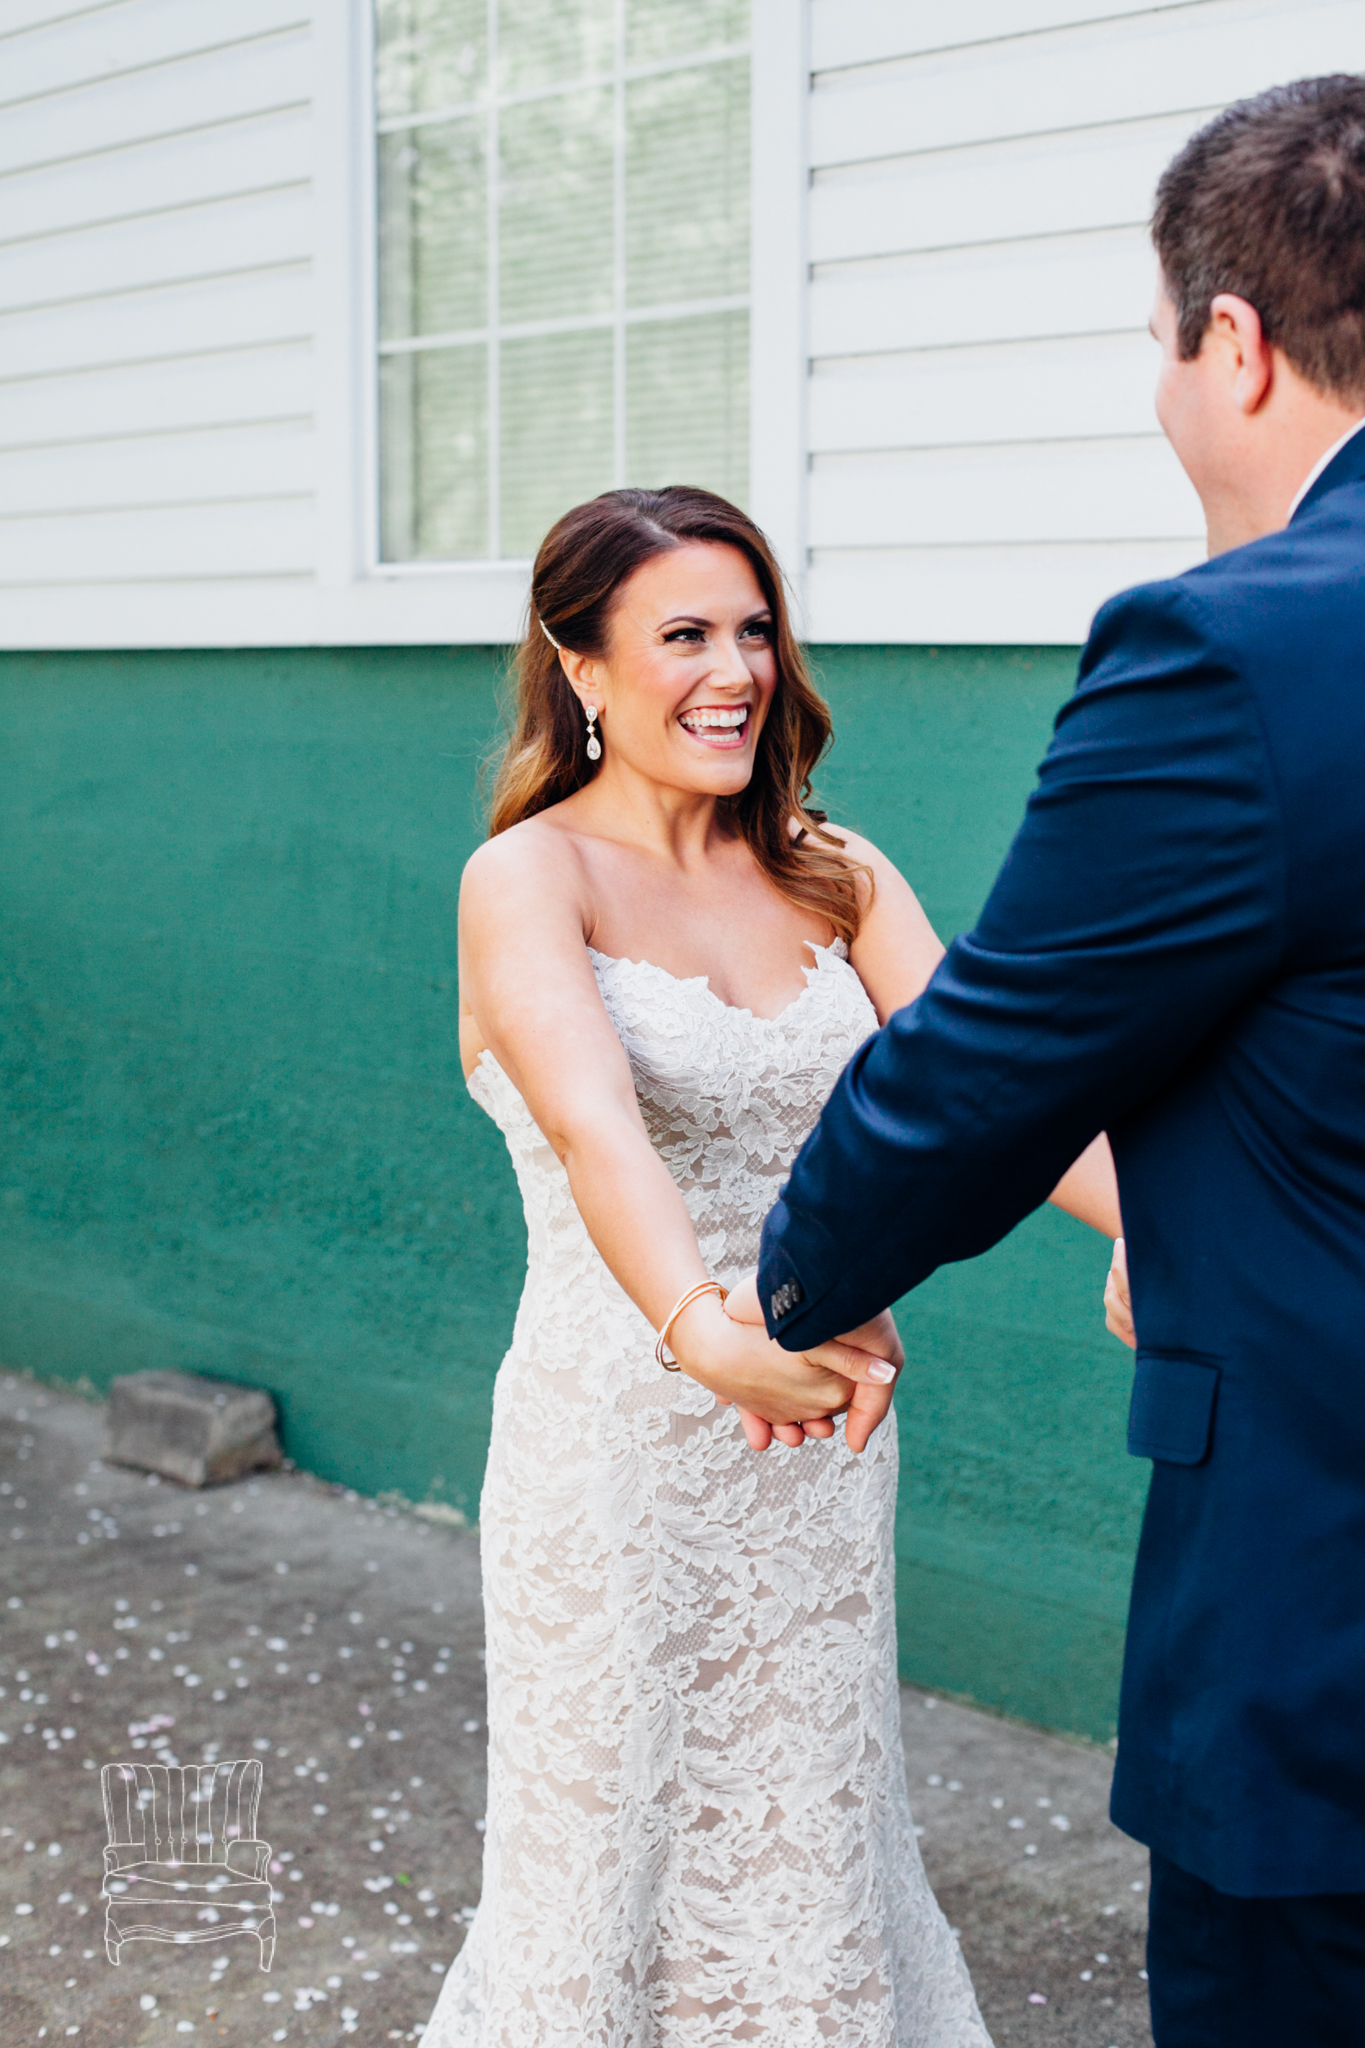 seattle-wedding-photographer-katheryn-moran-russells-bothell-wilkins-wedding-photo-15.jpg